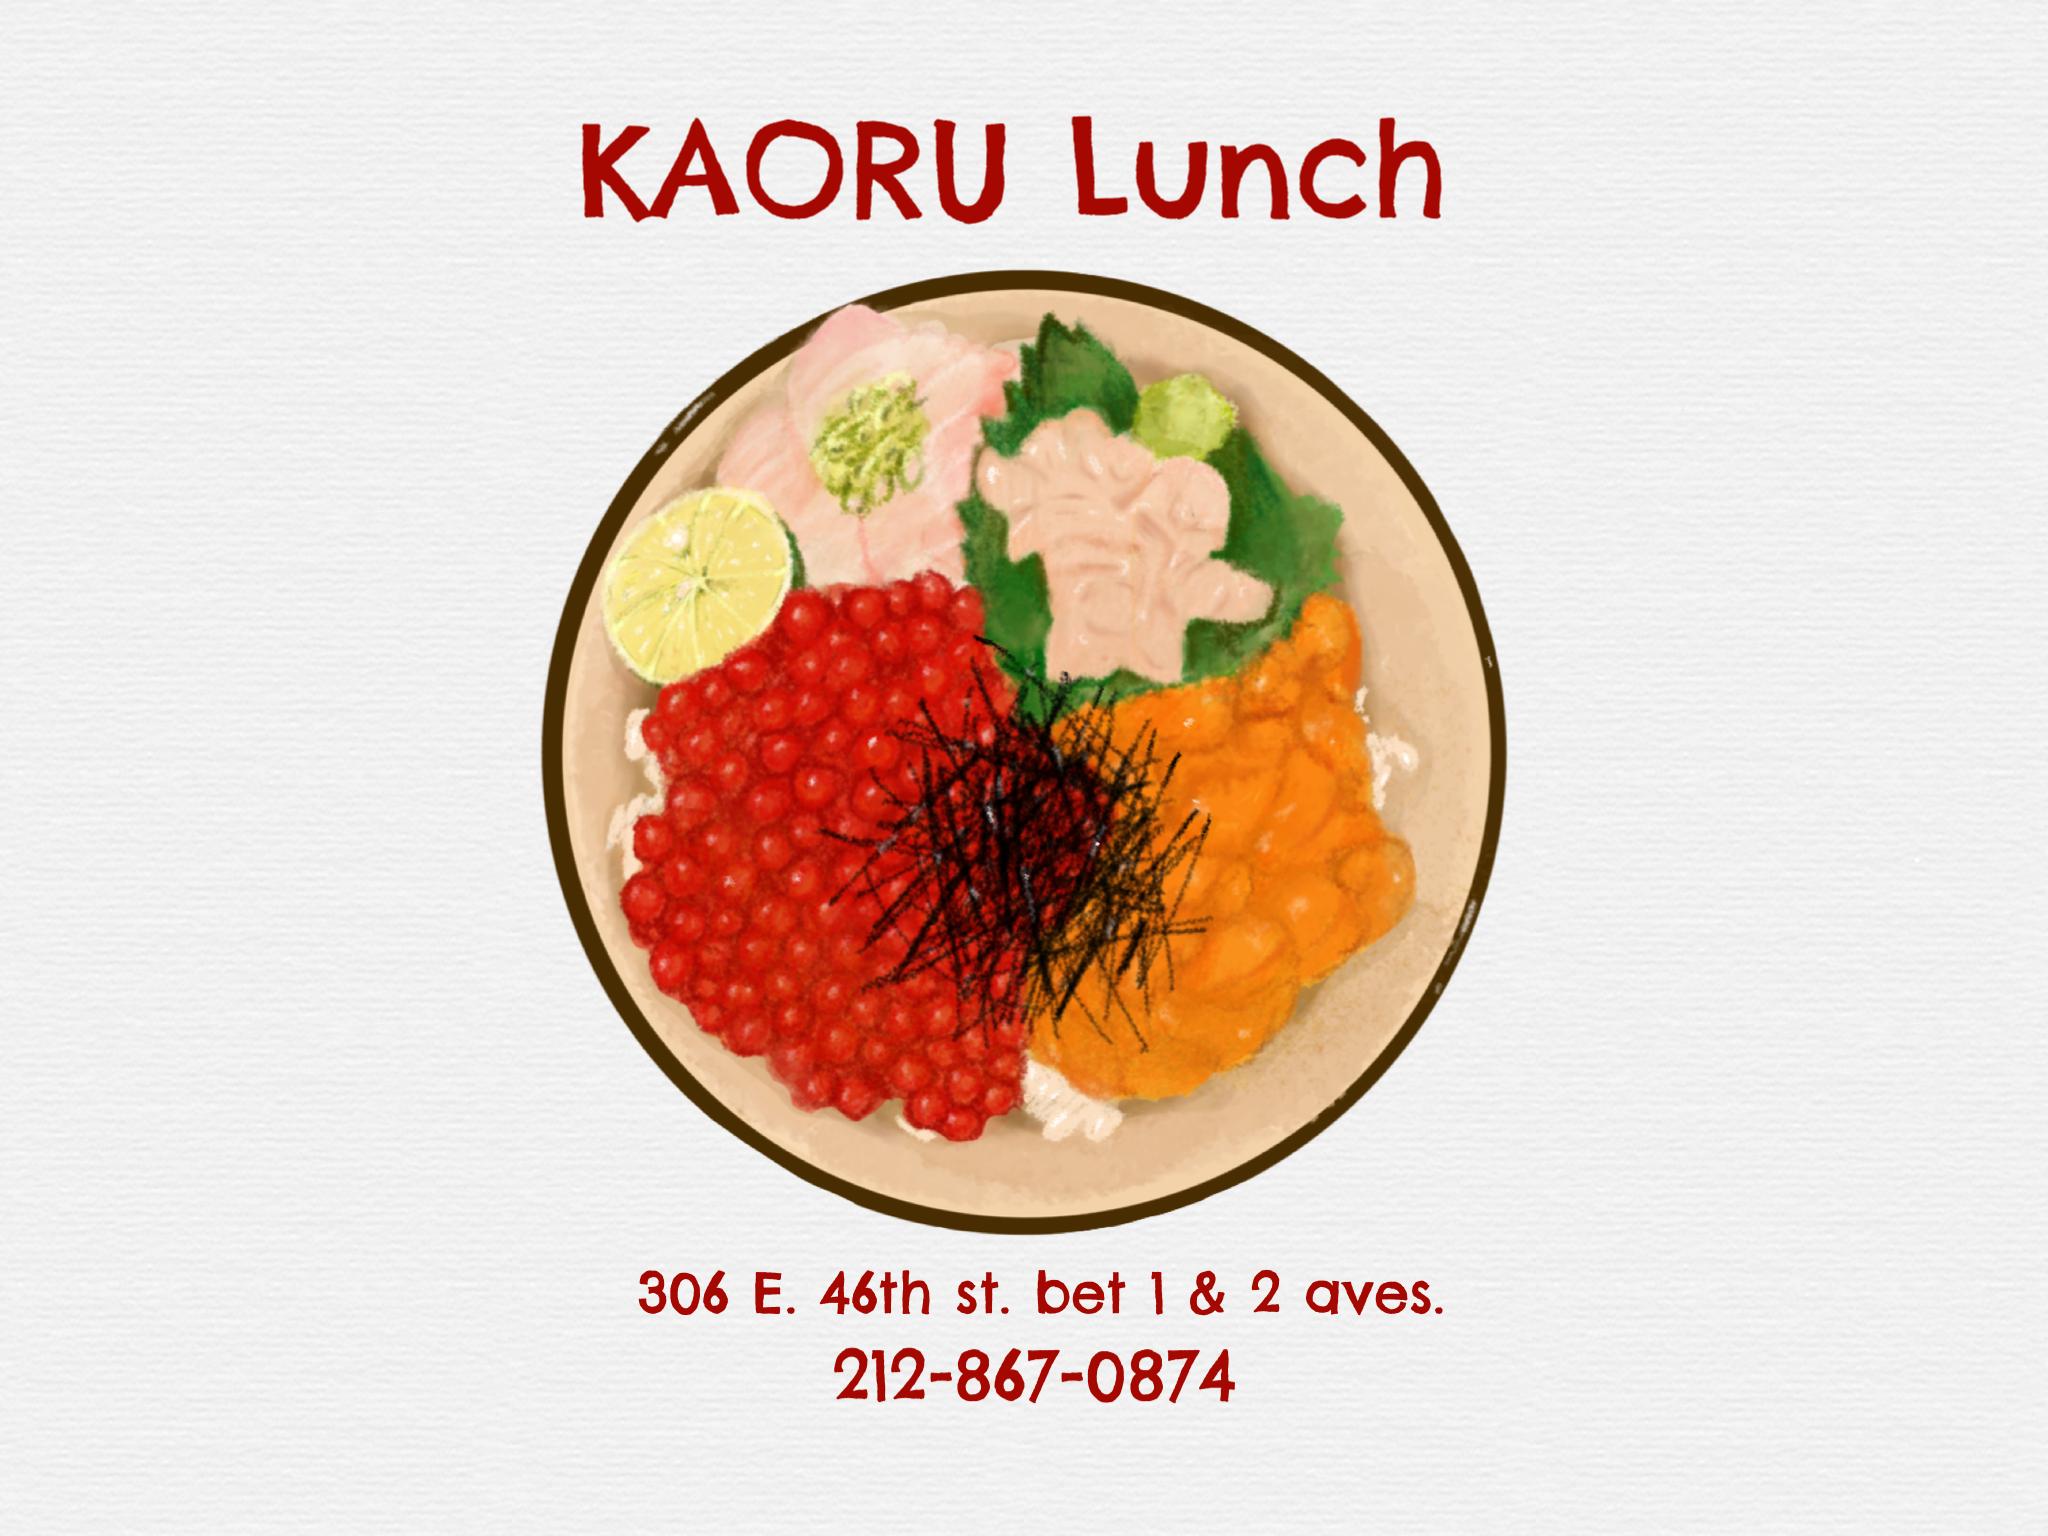 Kaoru restaurant in NYC